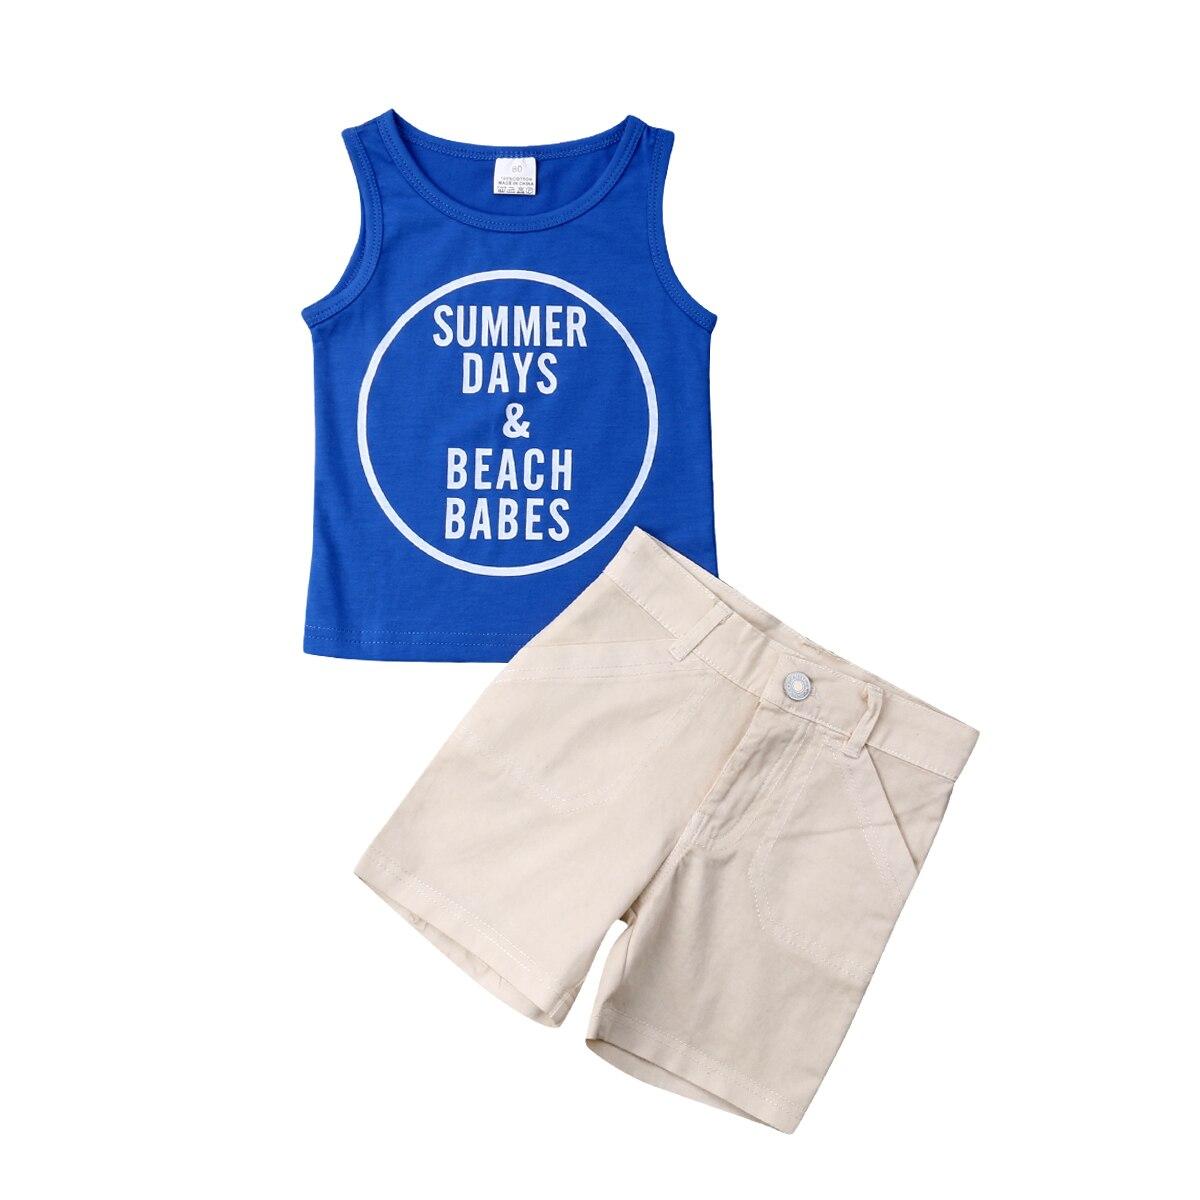 2 Pcs Kleinkind Kind Baby Jungen Kleidung Set Blau Brief Weste T-shirt Tops + Shorts Casual Outfits Kind Jungen Strand Kleidung